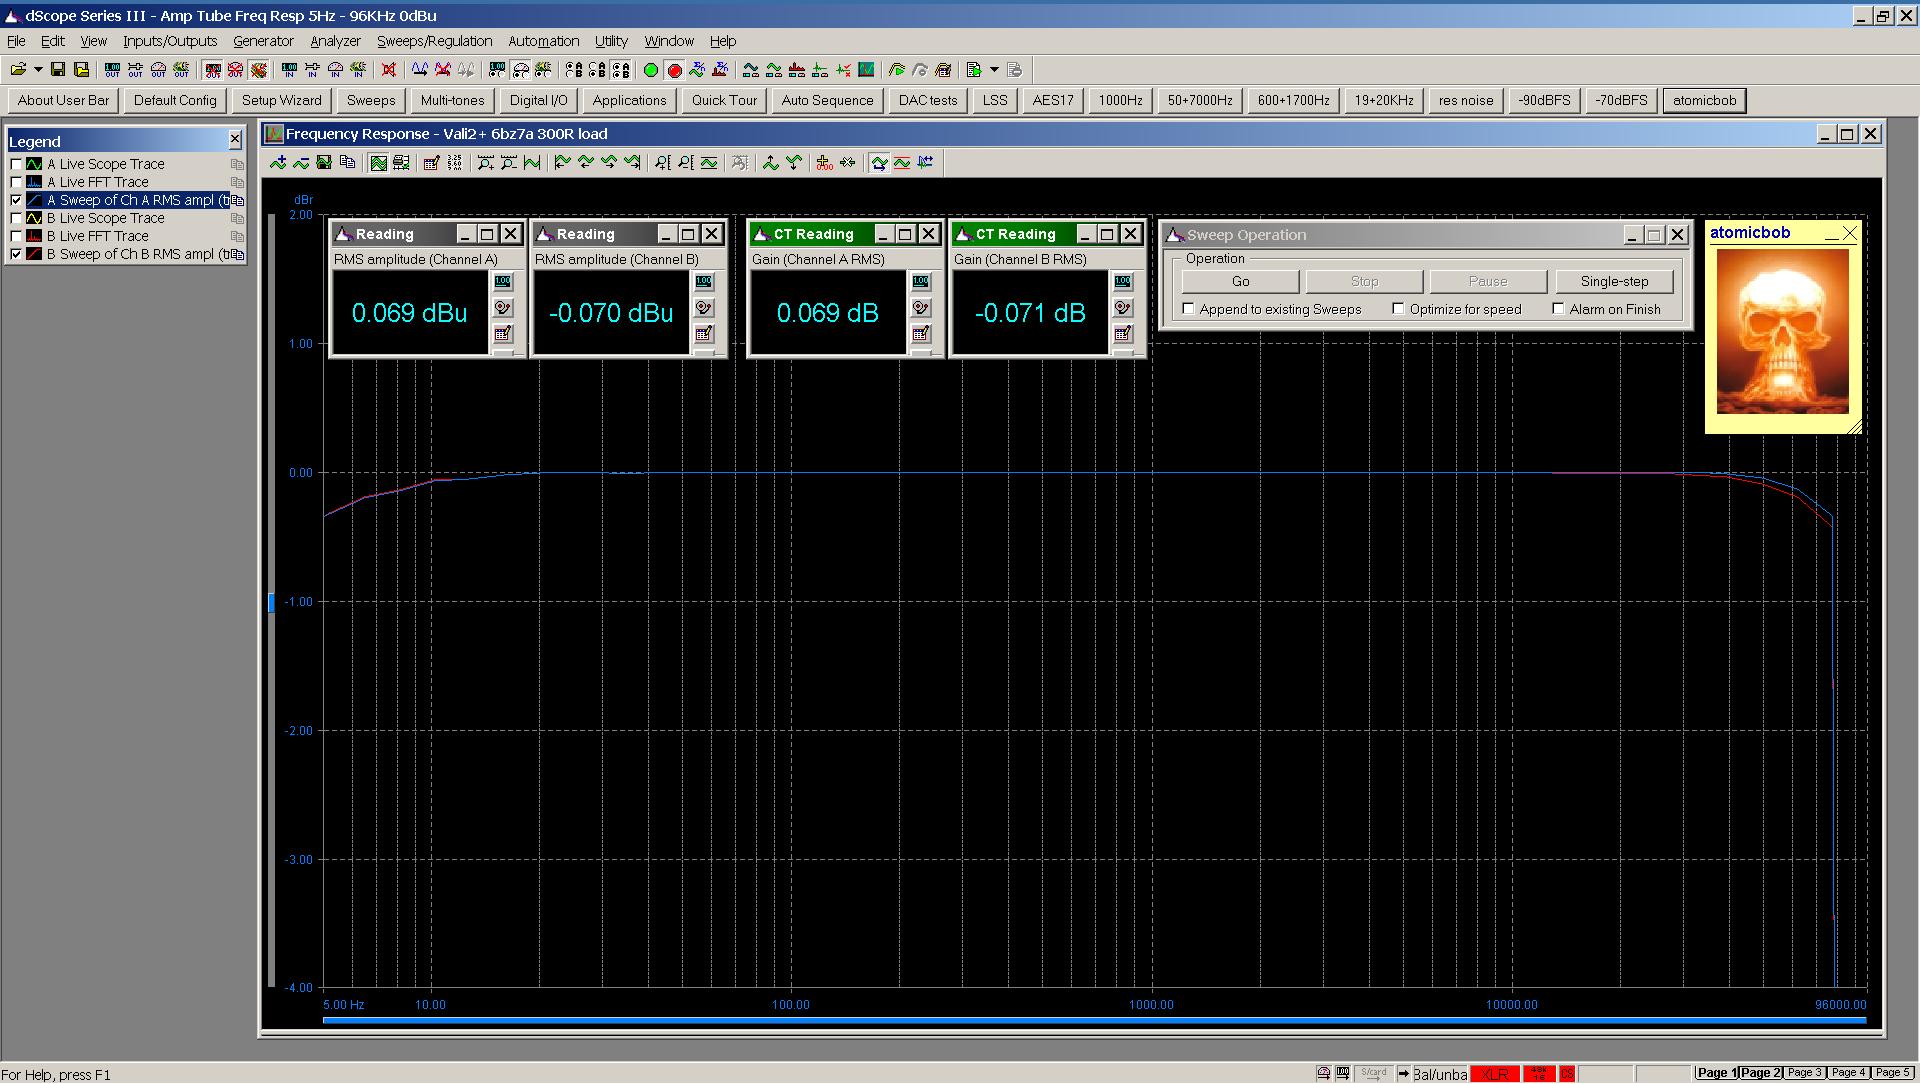 20201120 Vali2+ 6bz7a frequency response 5Hz - 96KHz 300R 0dBu.png